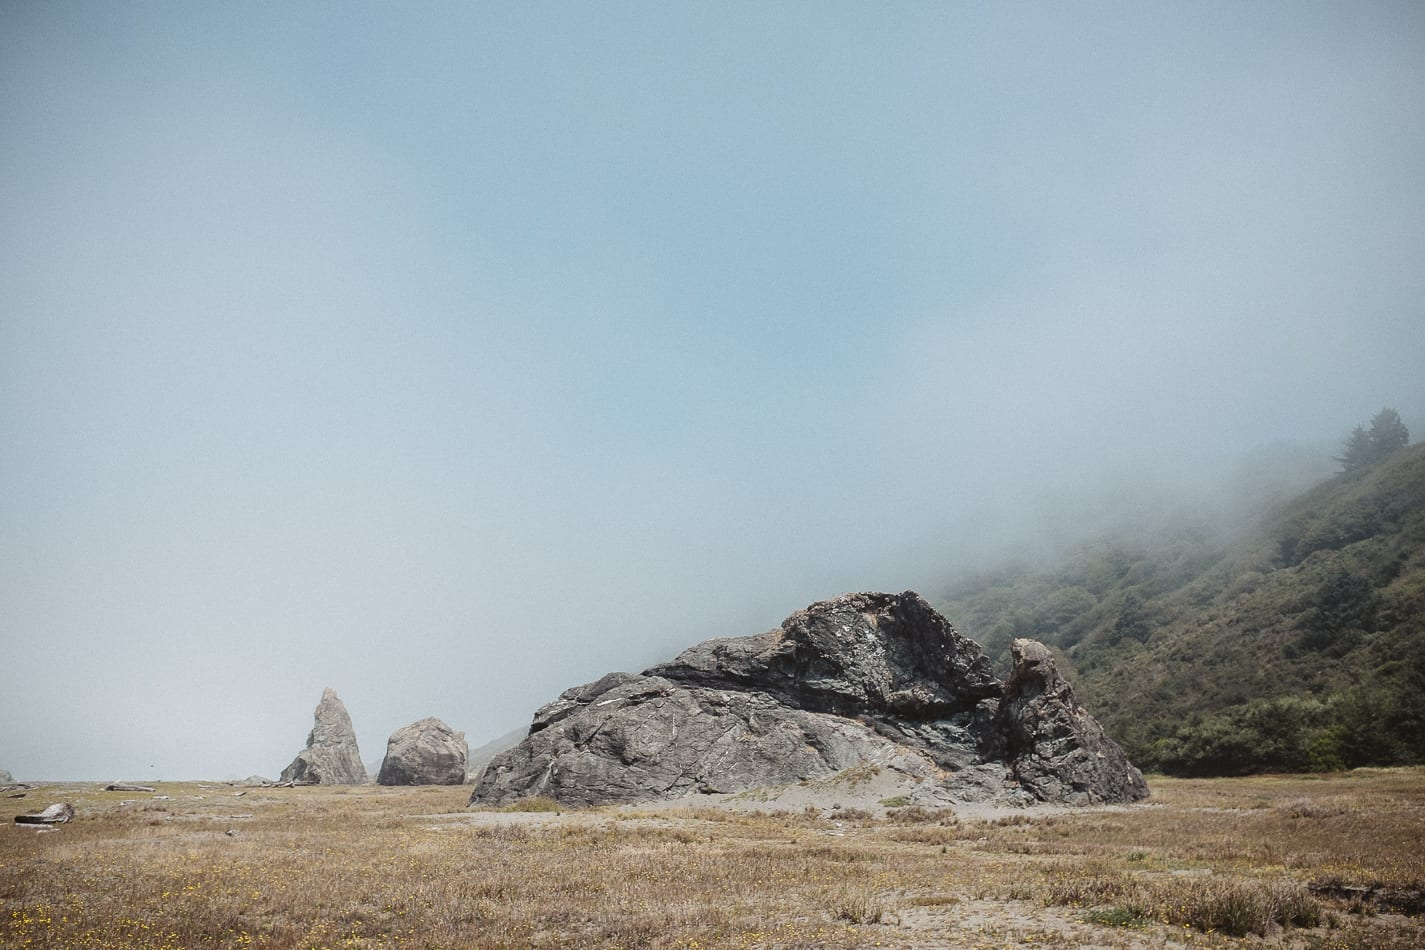 patricks-point-beach-camping-california-adventure-photographer-27